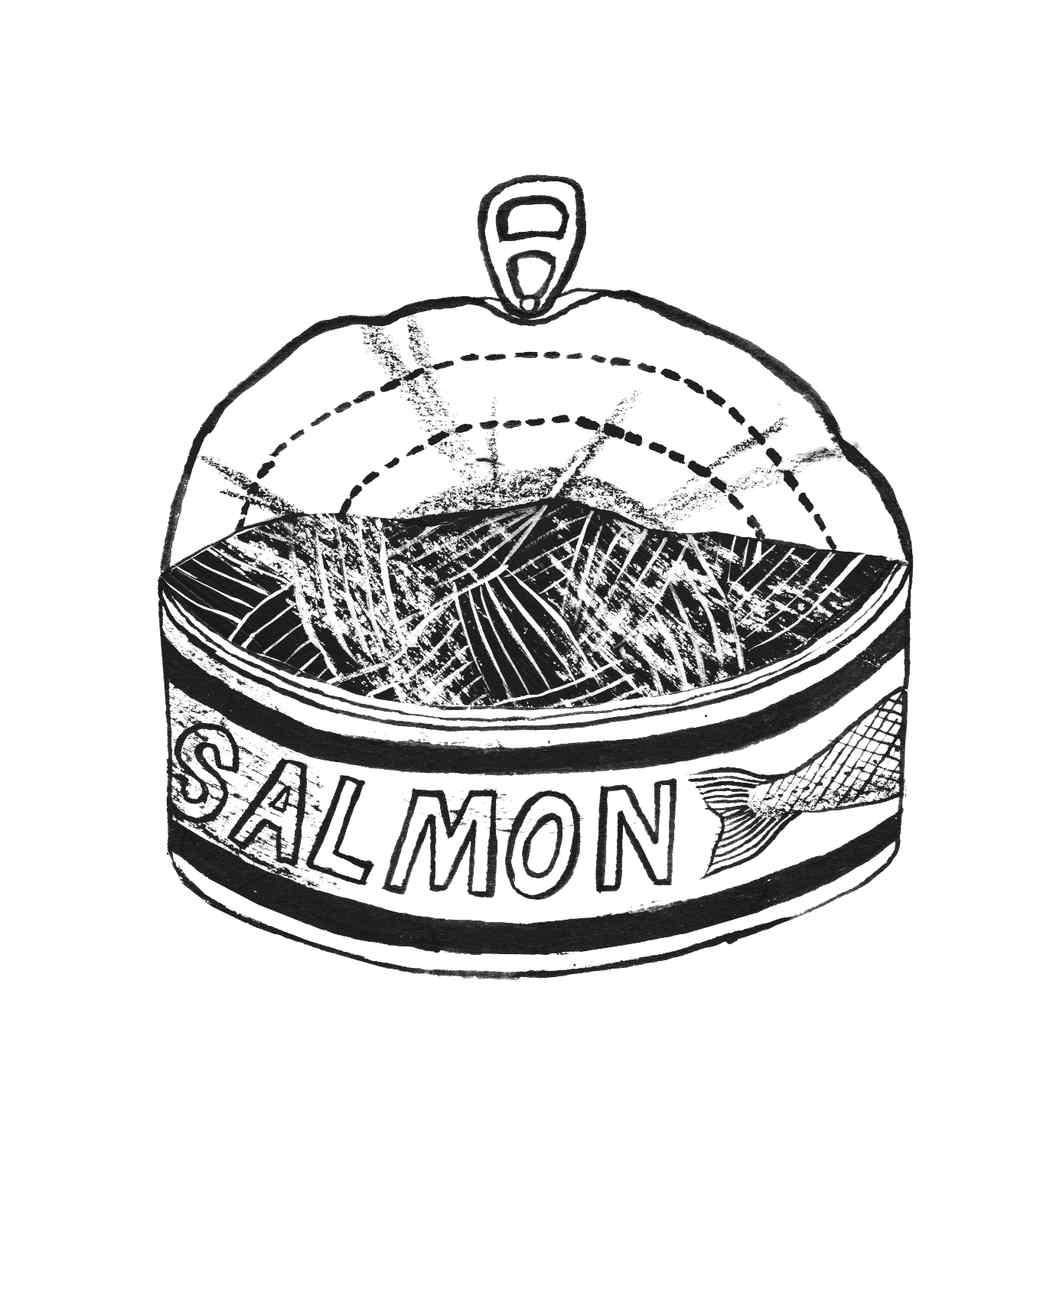 canned-salmonillosfina_i112967l.jpg